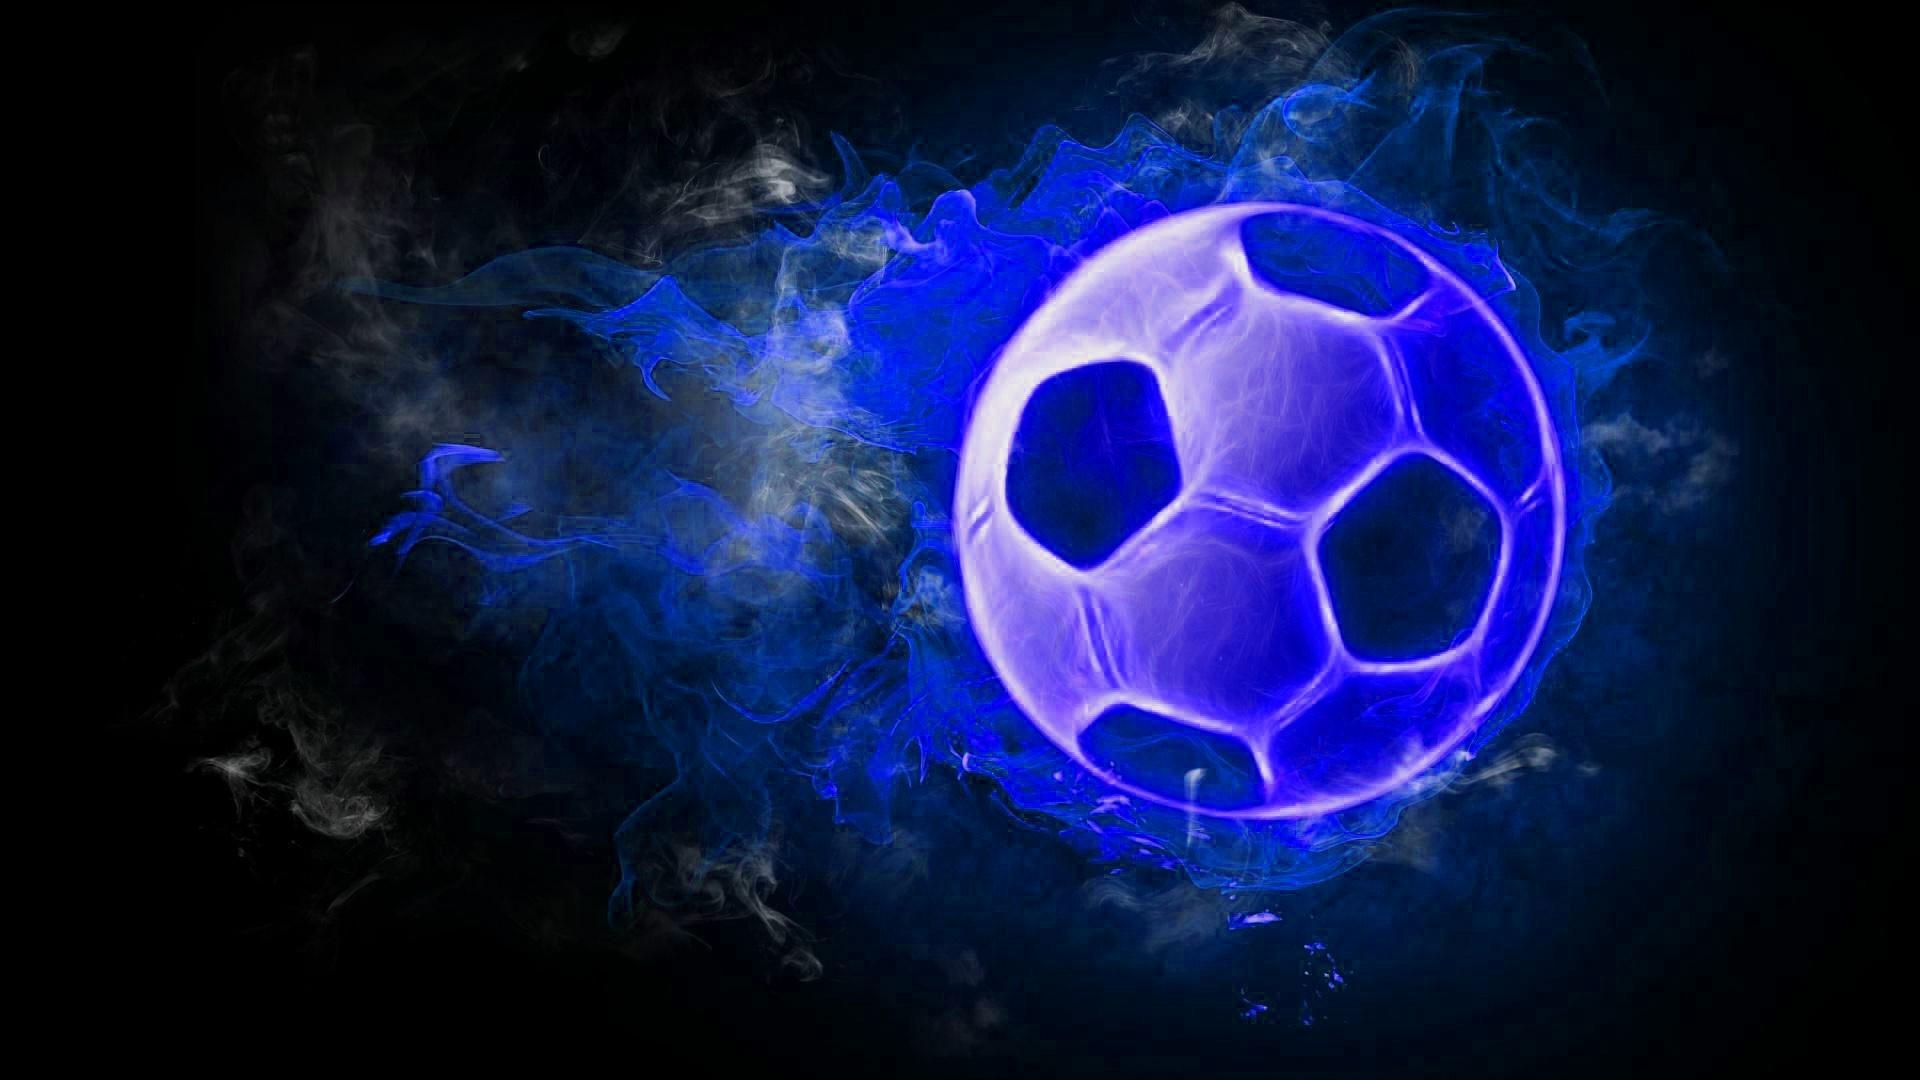 Fußball Hd